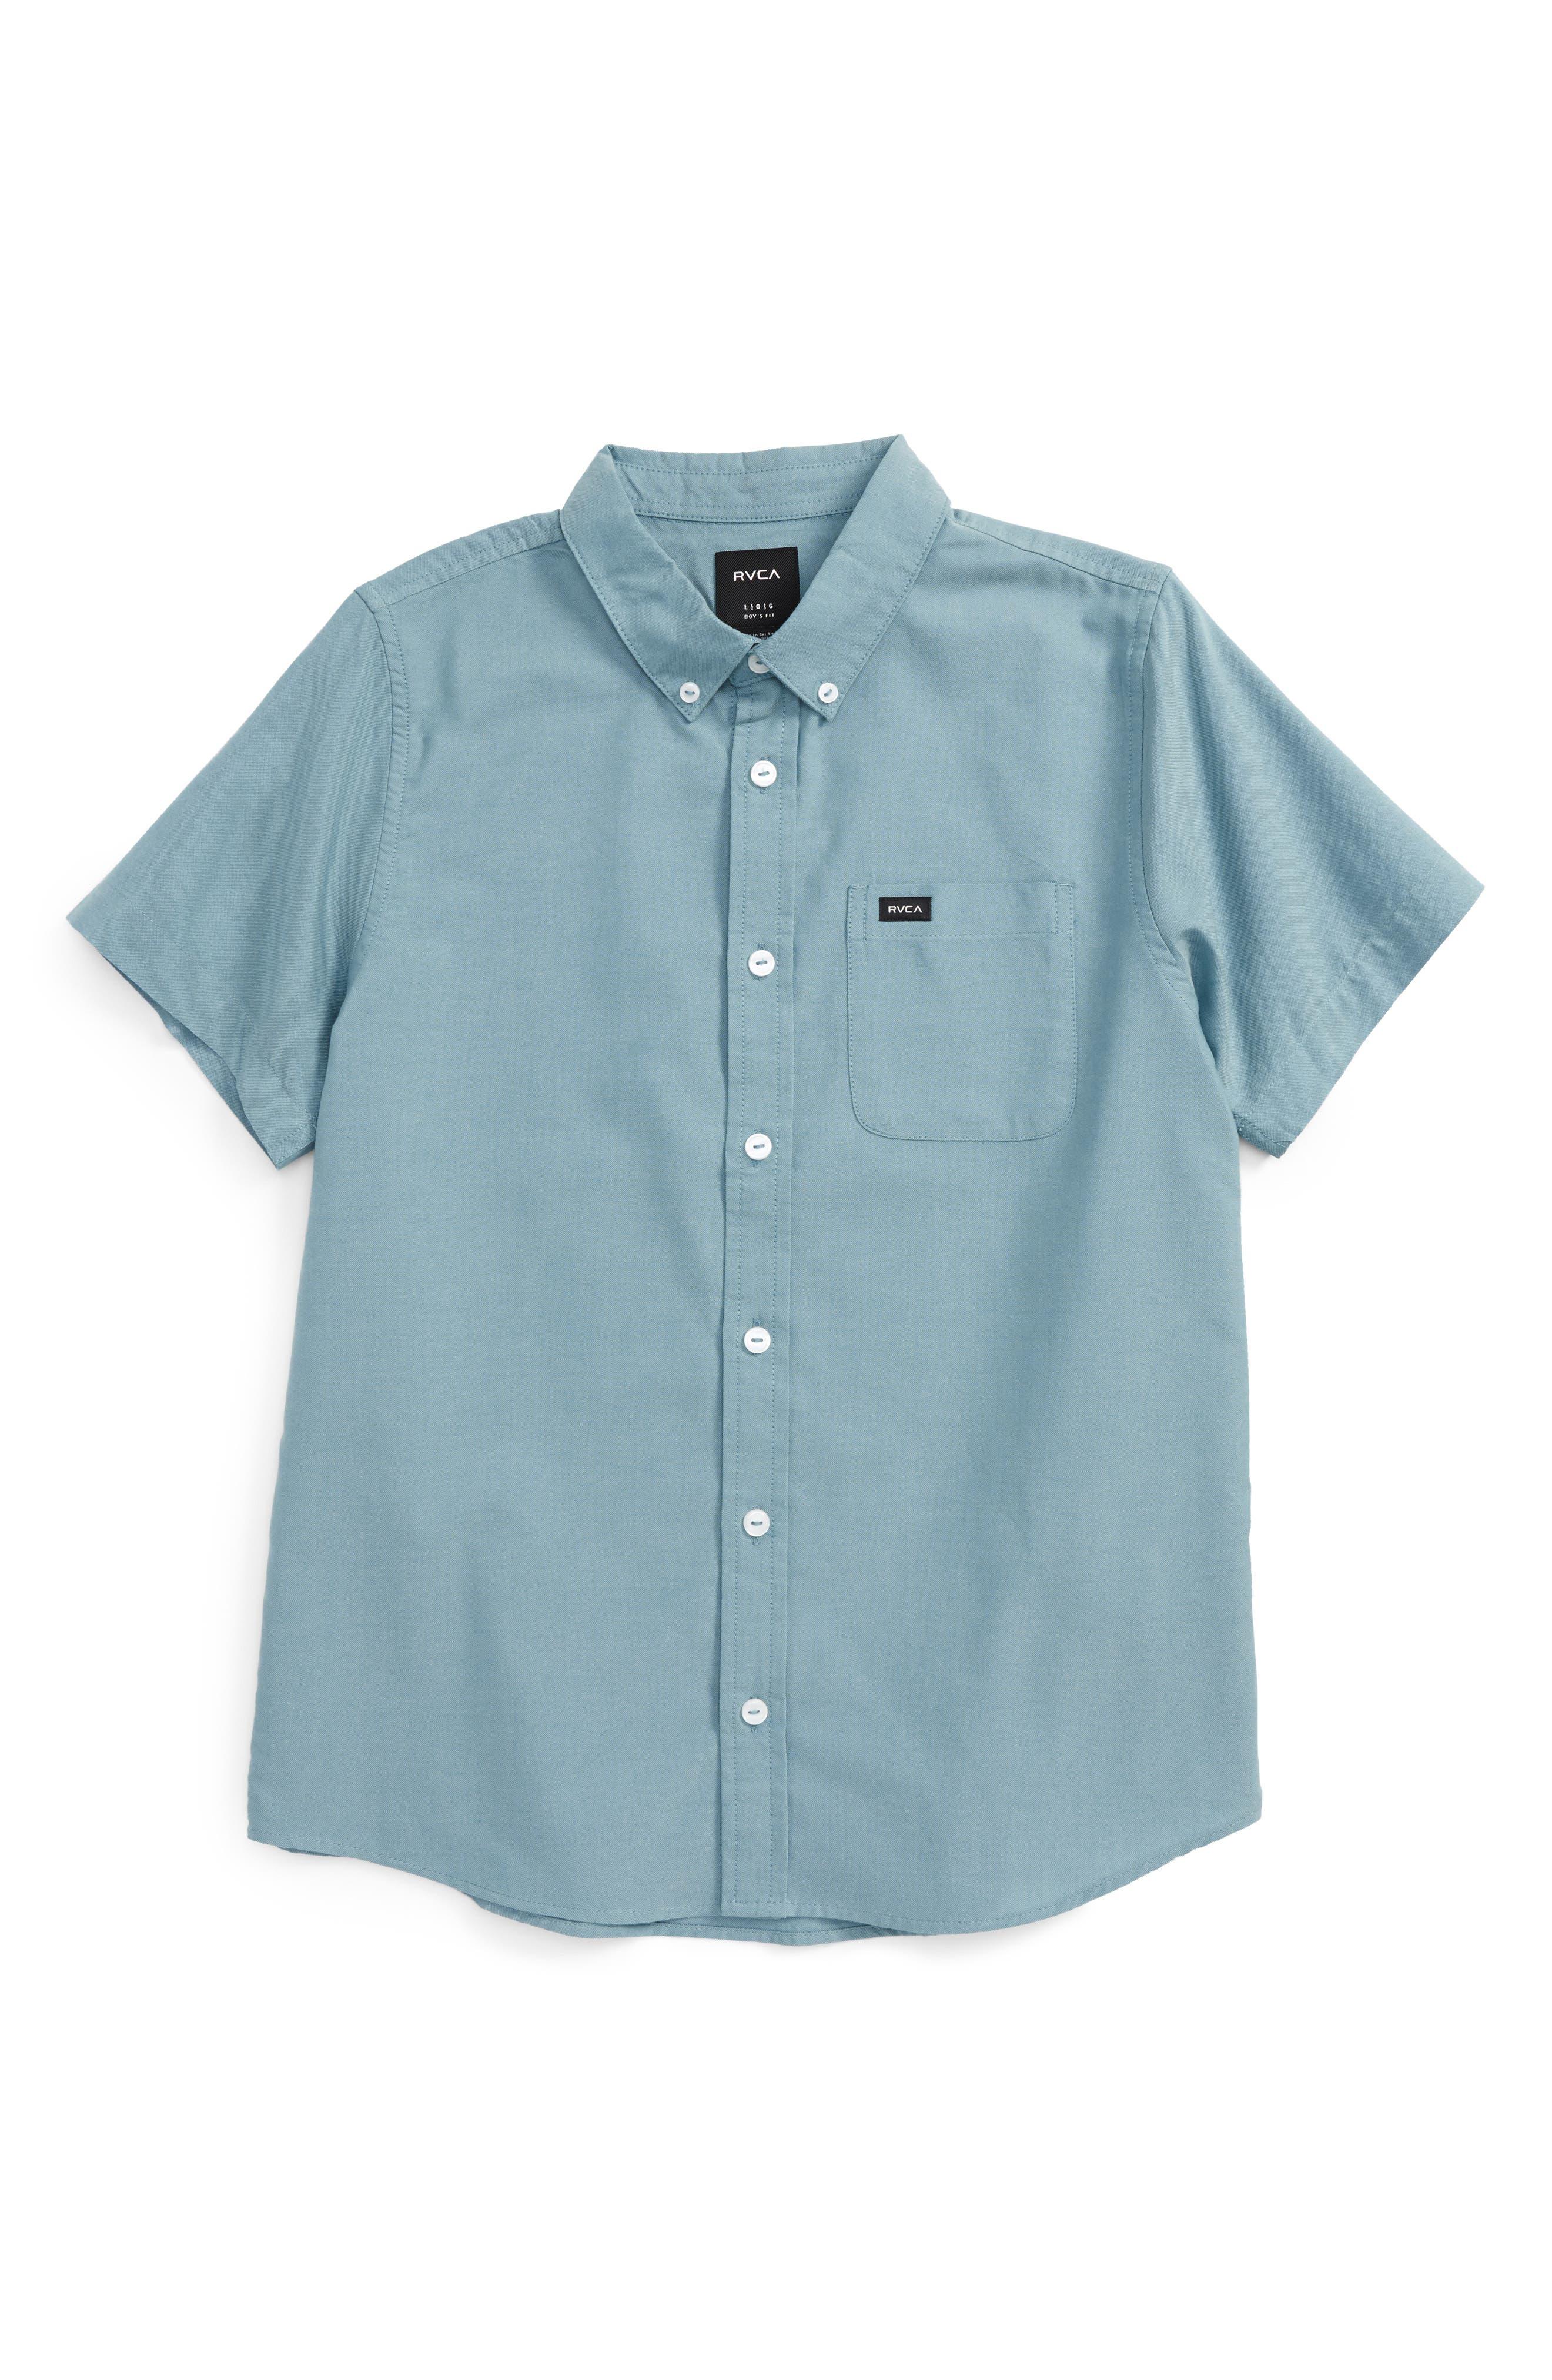 'That'll Do' Woven Shirt,                             Main thumbnail 4, color,